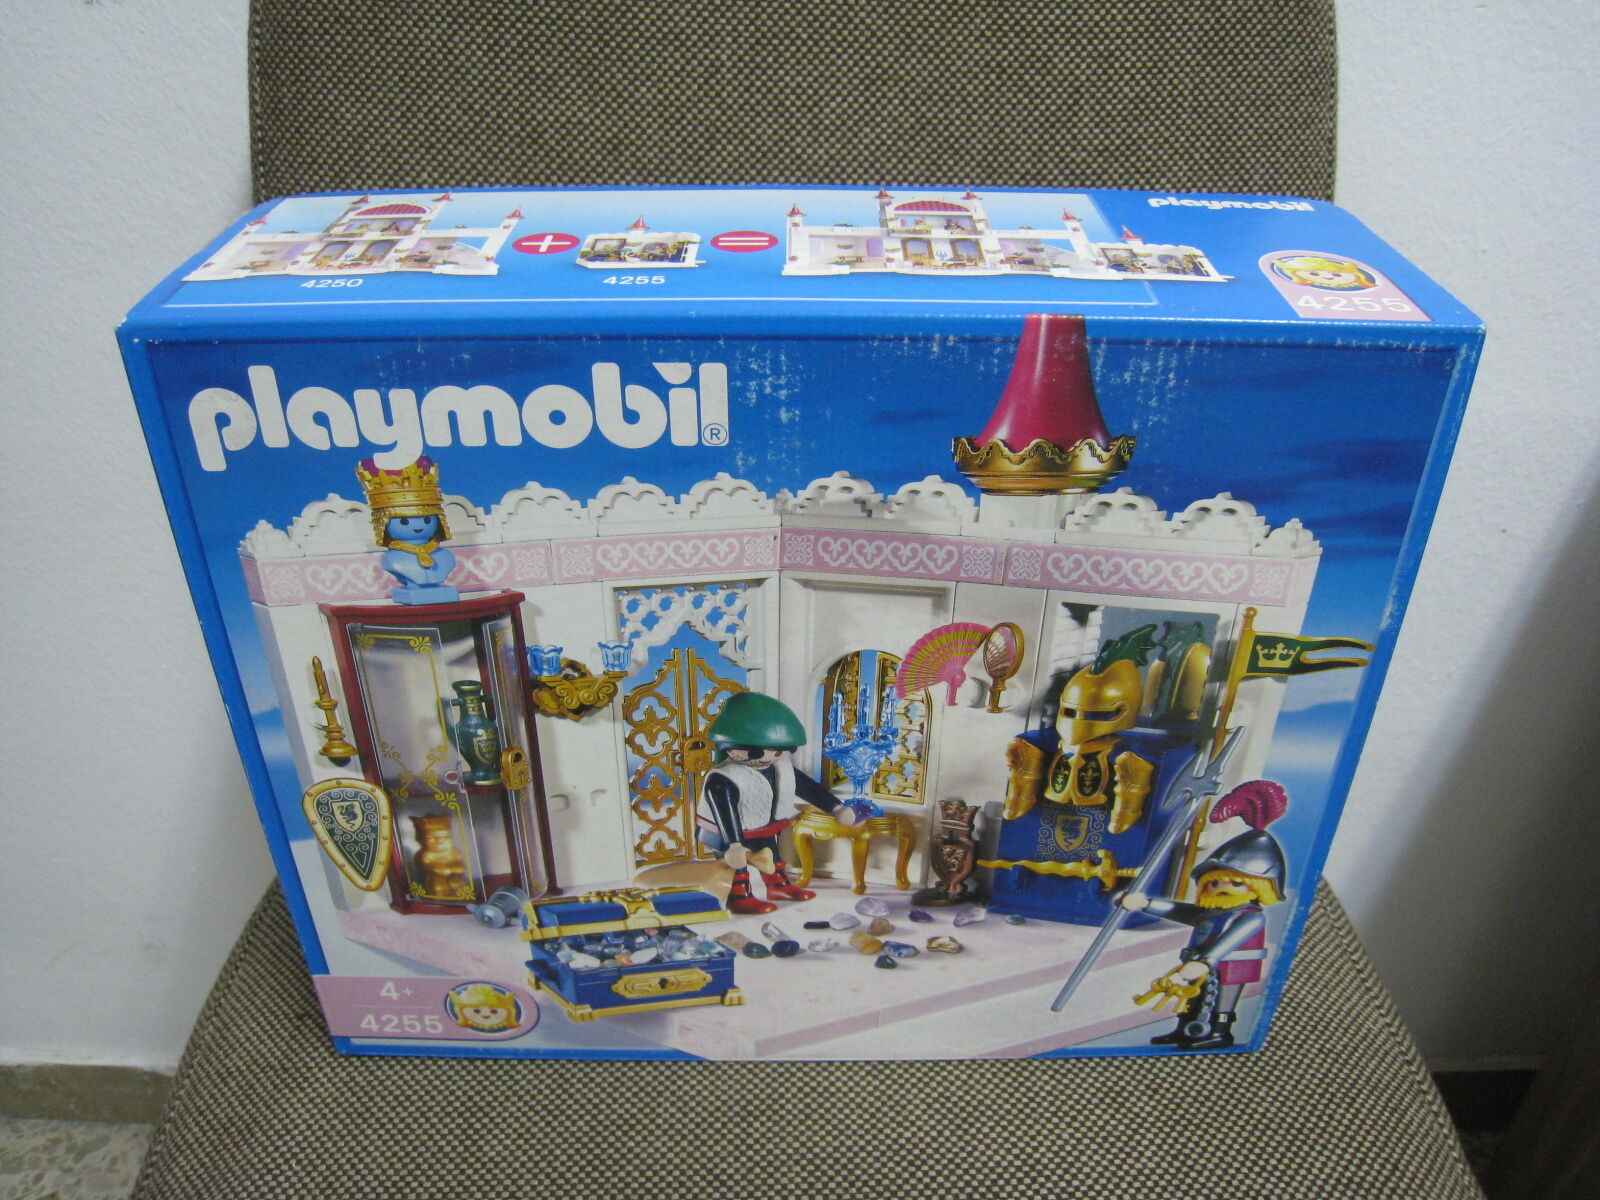 Playmobil - Fairy Tales City Museo - Sala Tesoro Real - 4255 - (NUEVO) OVP